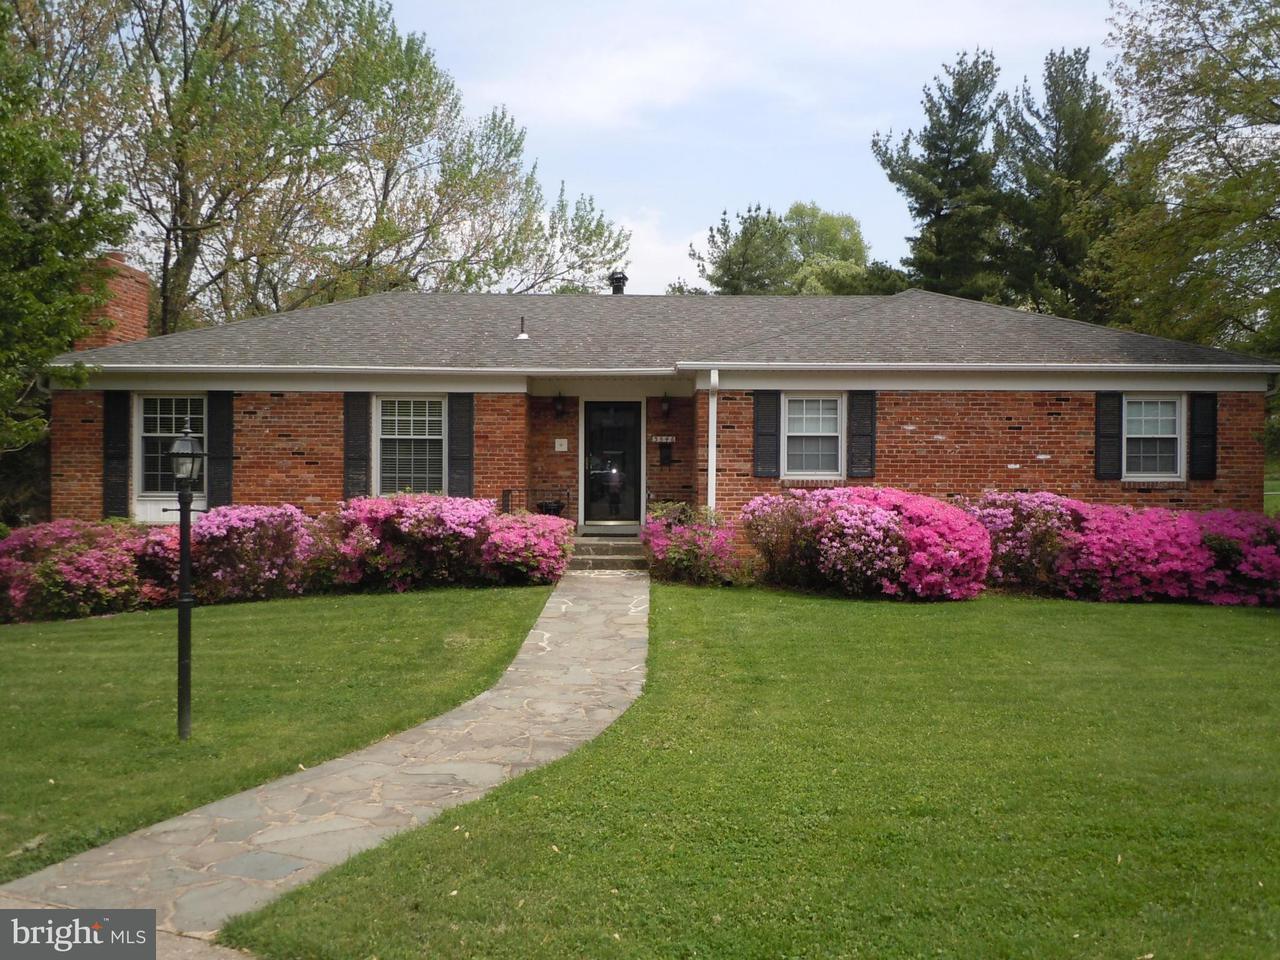 Single Family Home for Sale at 3546 ABINGDON Street 3546 ABINGDON Street Arlington, Virginia 22207 United States